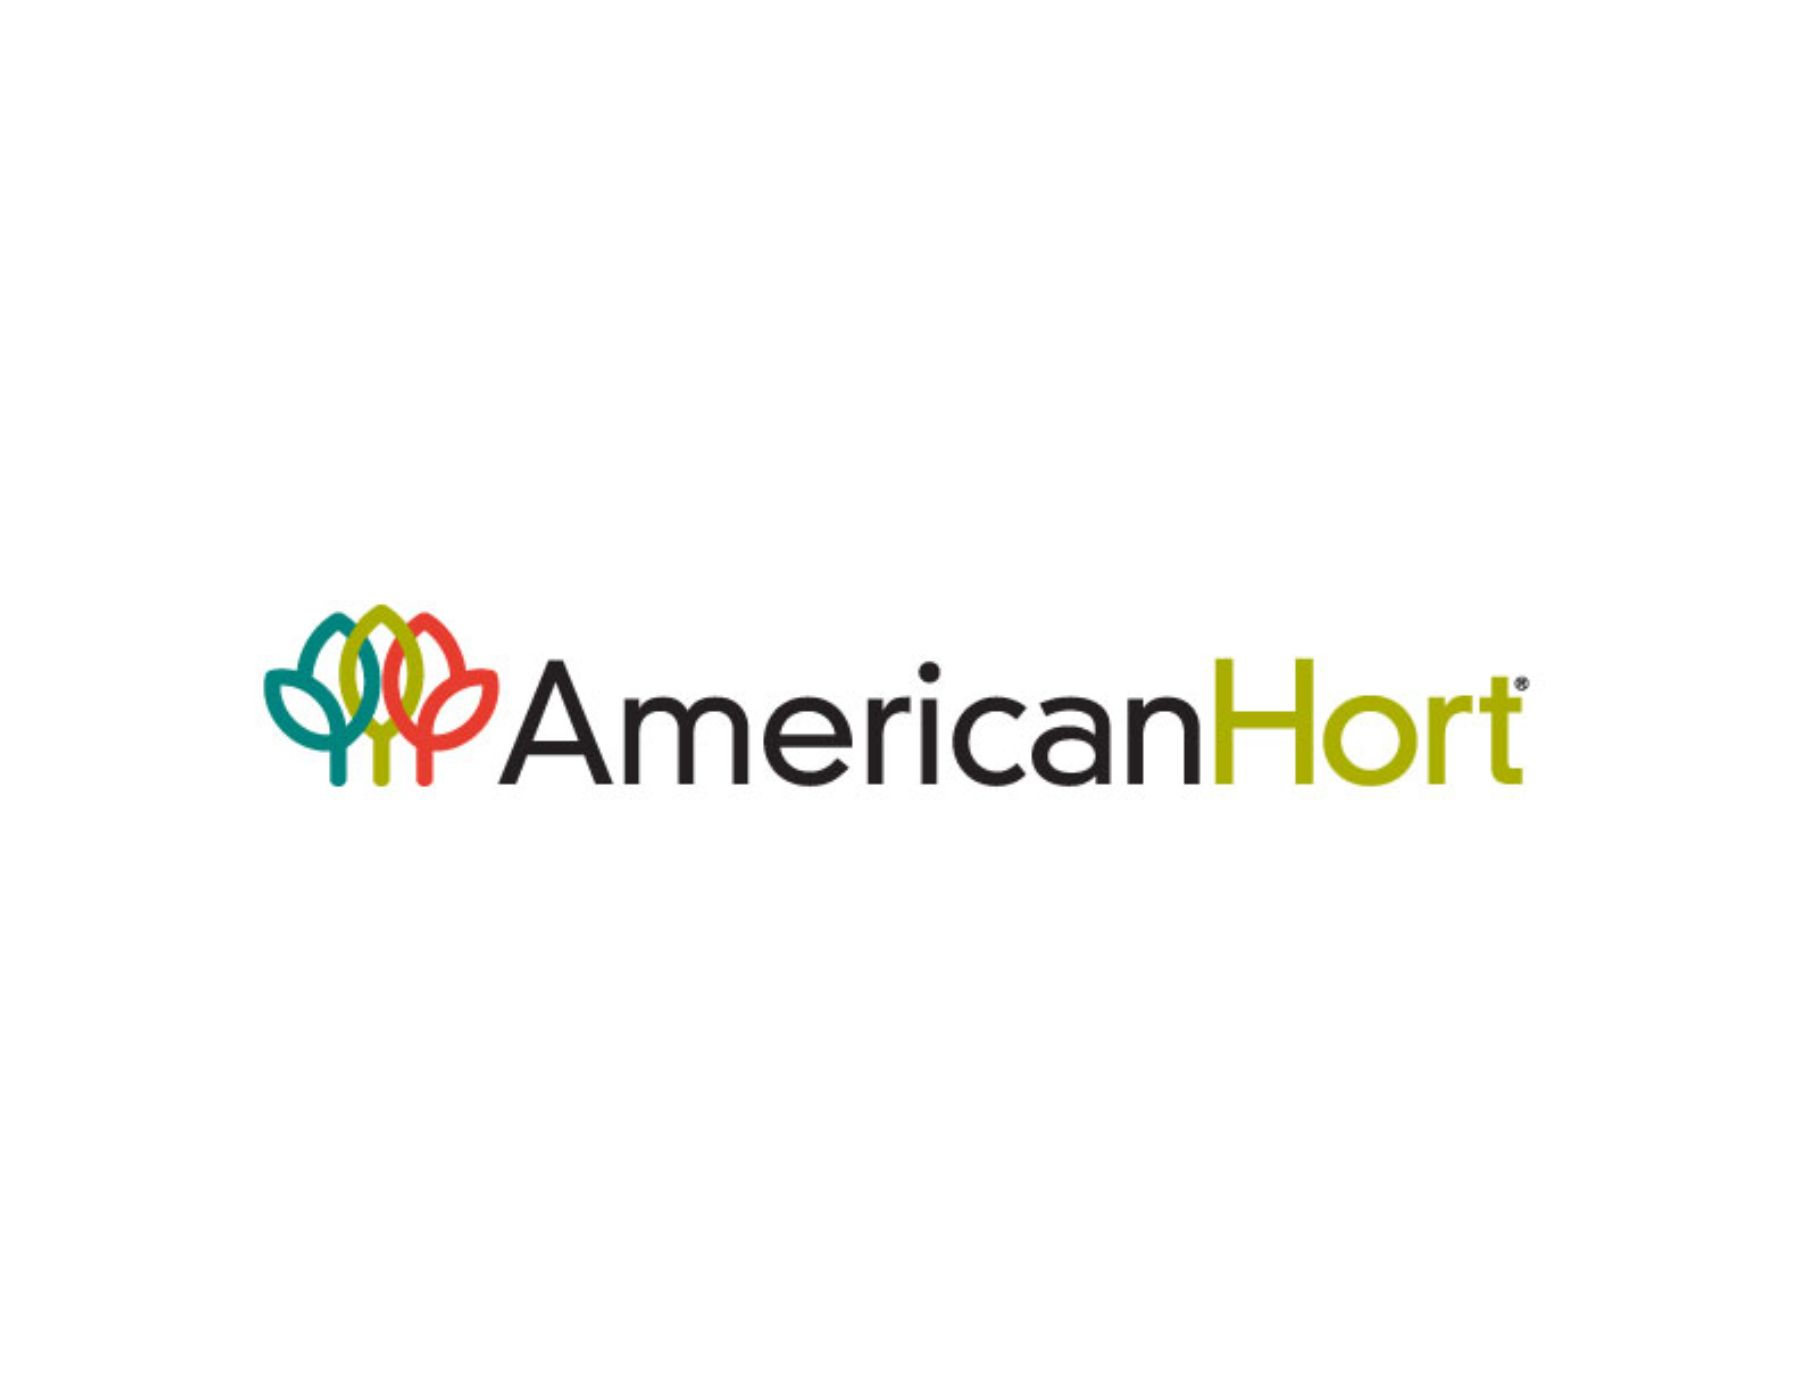 American Hort Logo